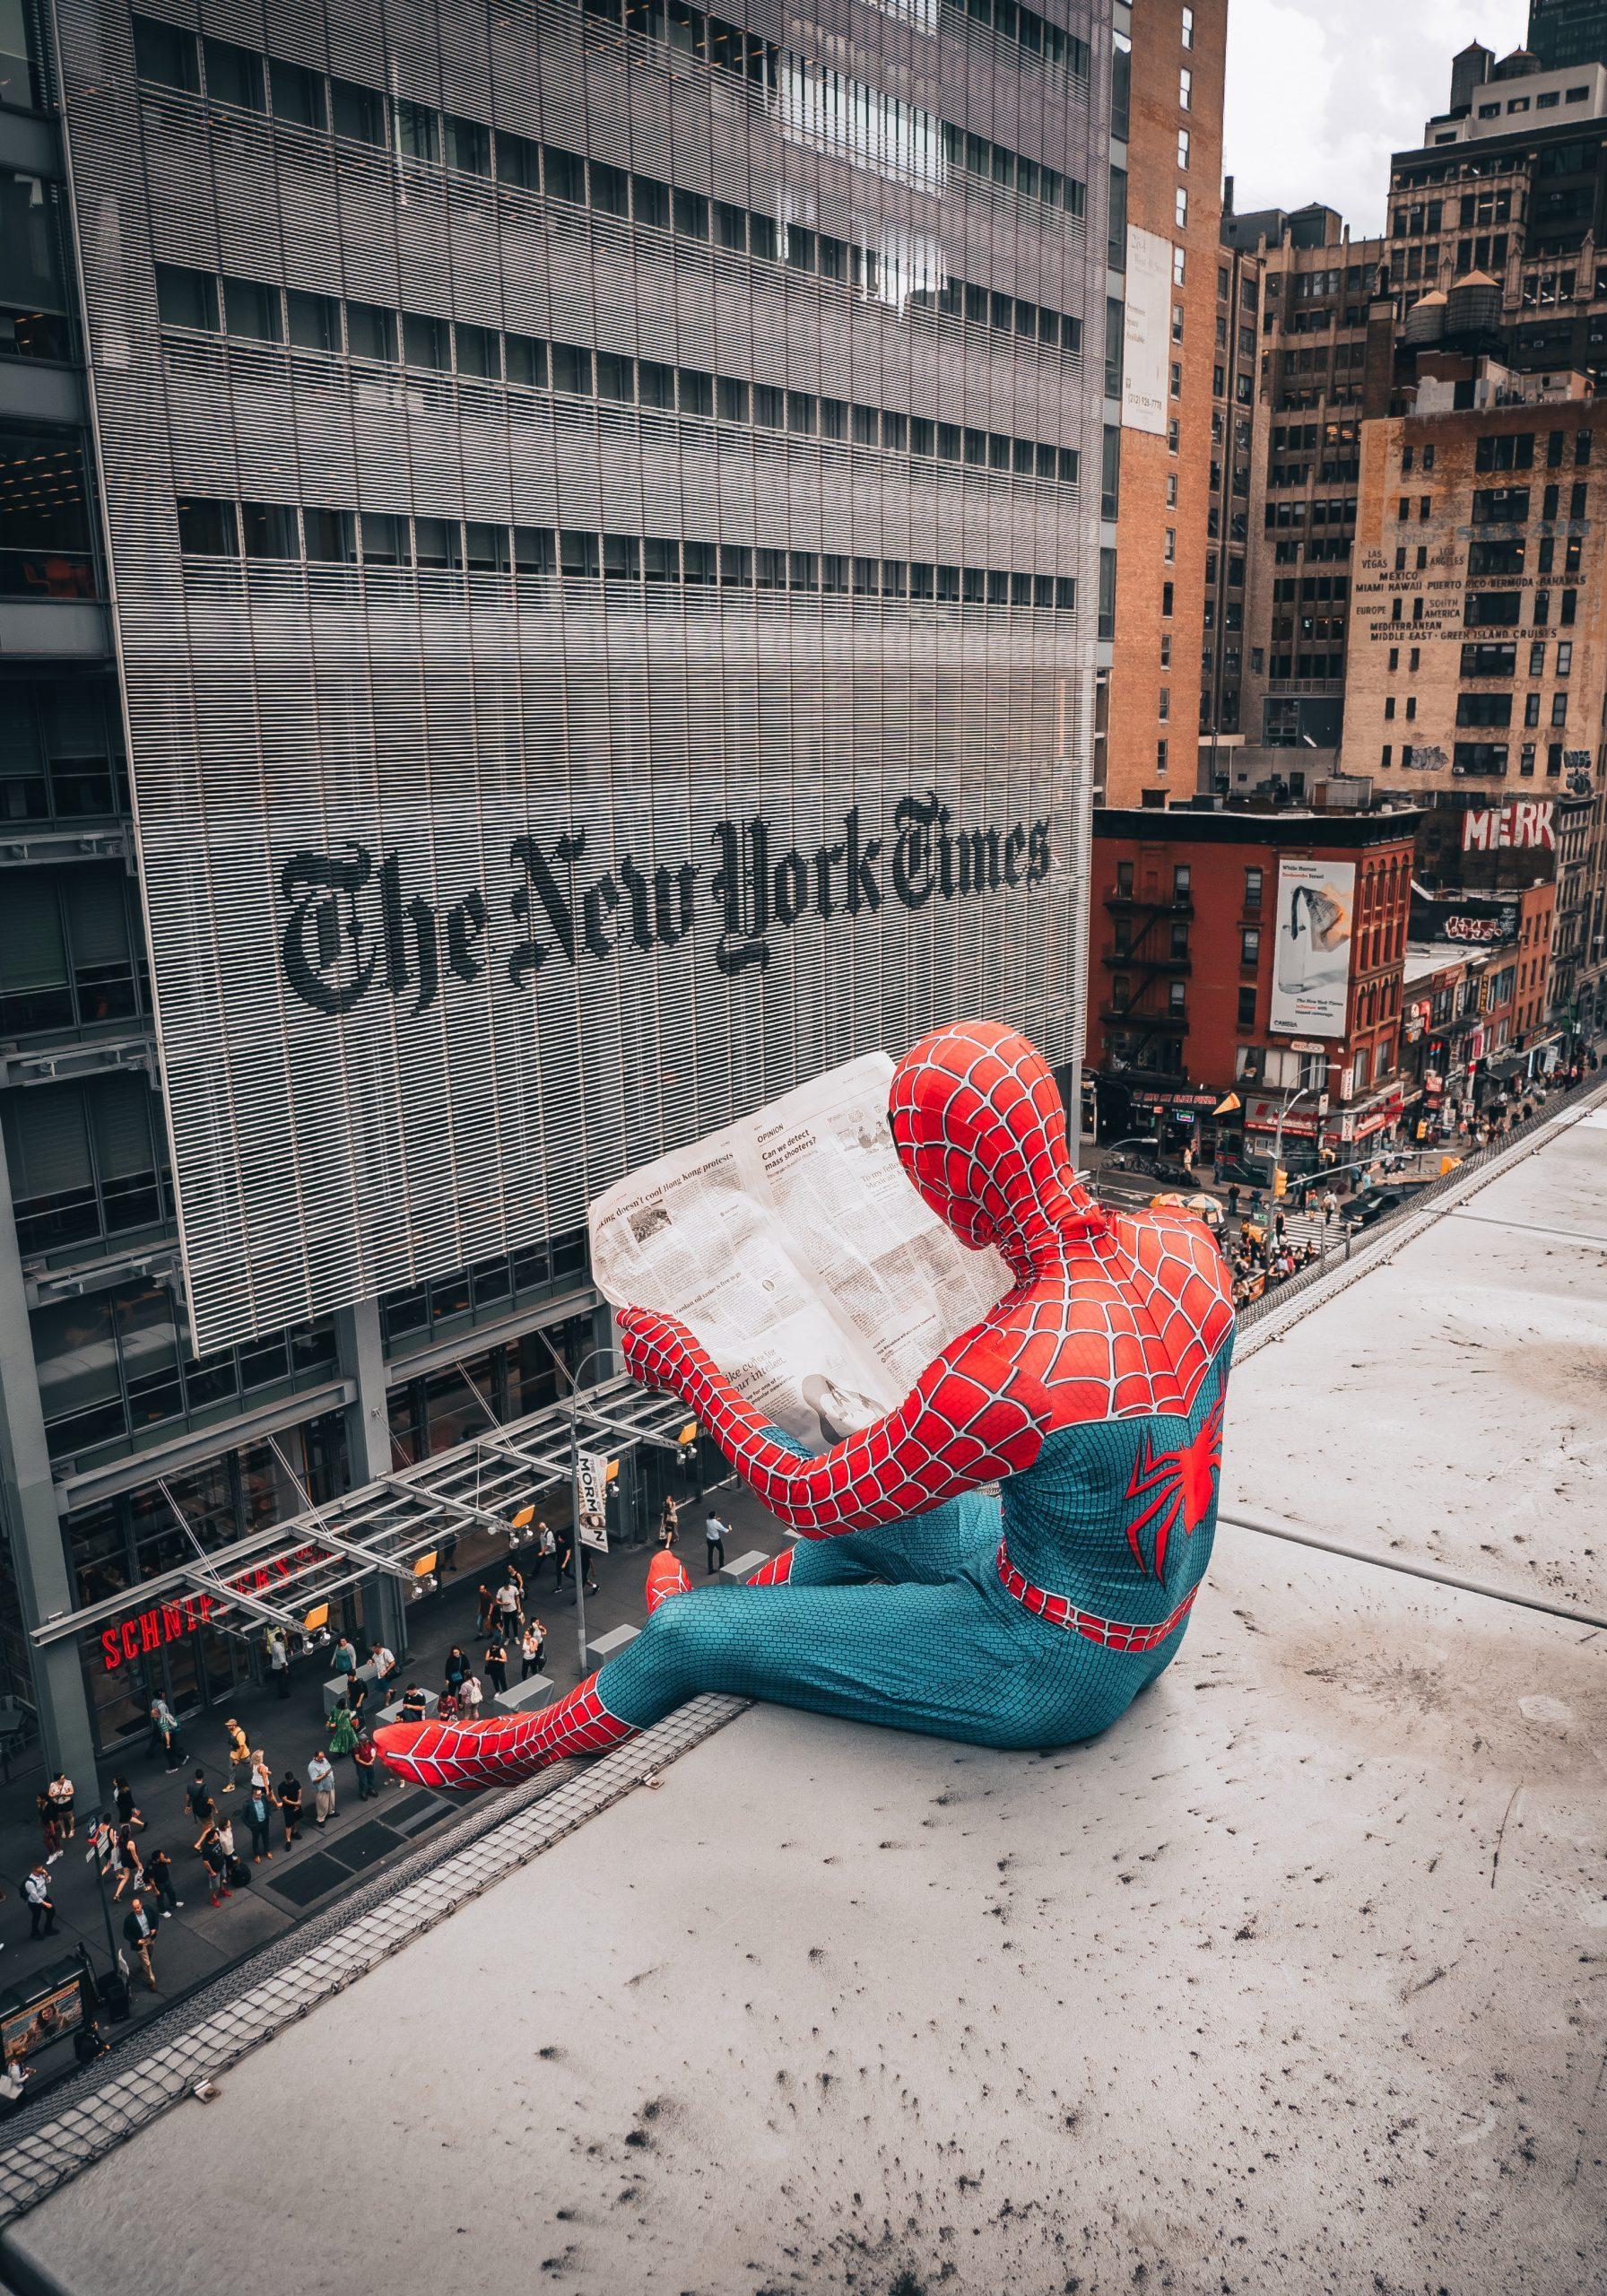 spiderman, news york,journal, new york times